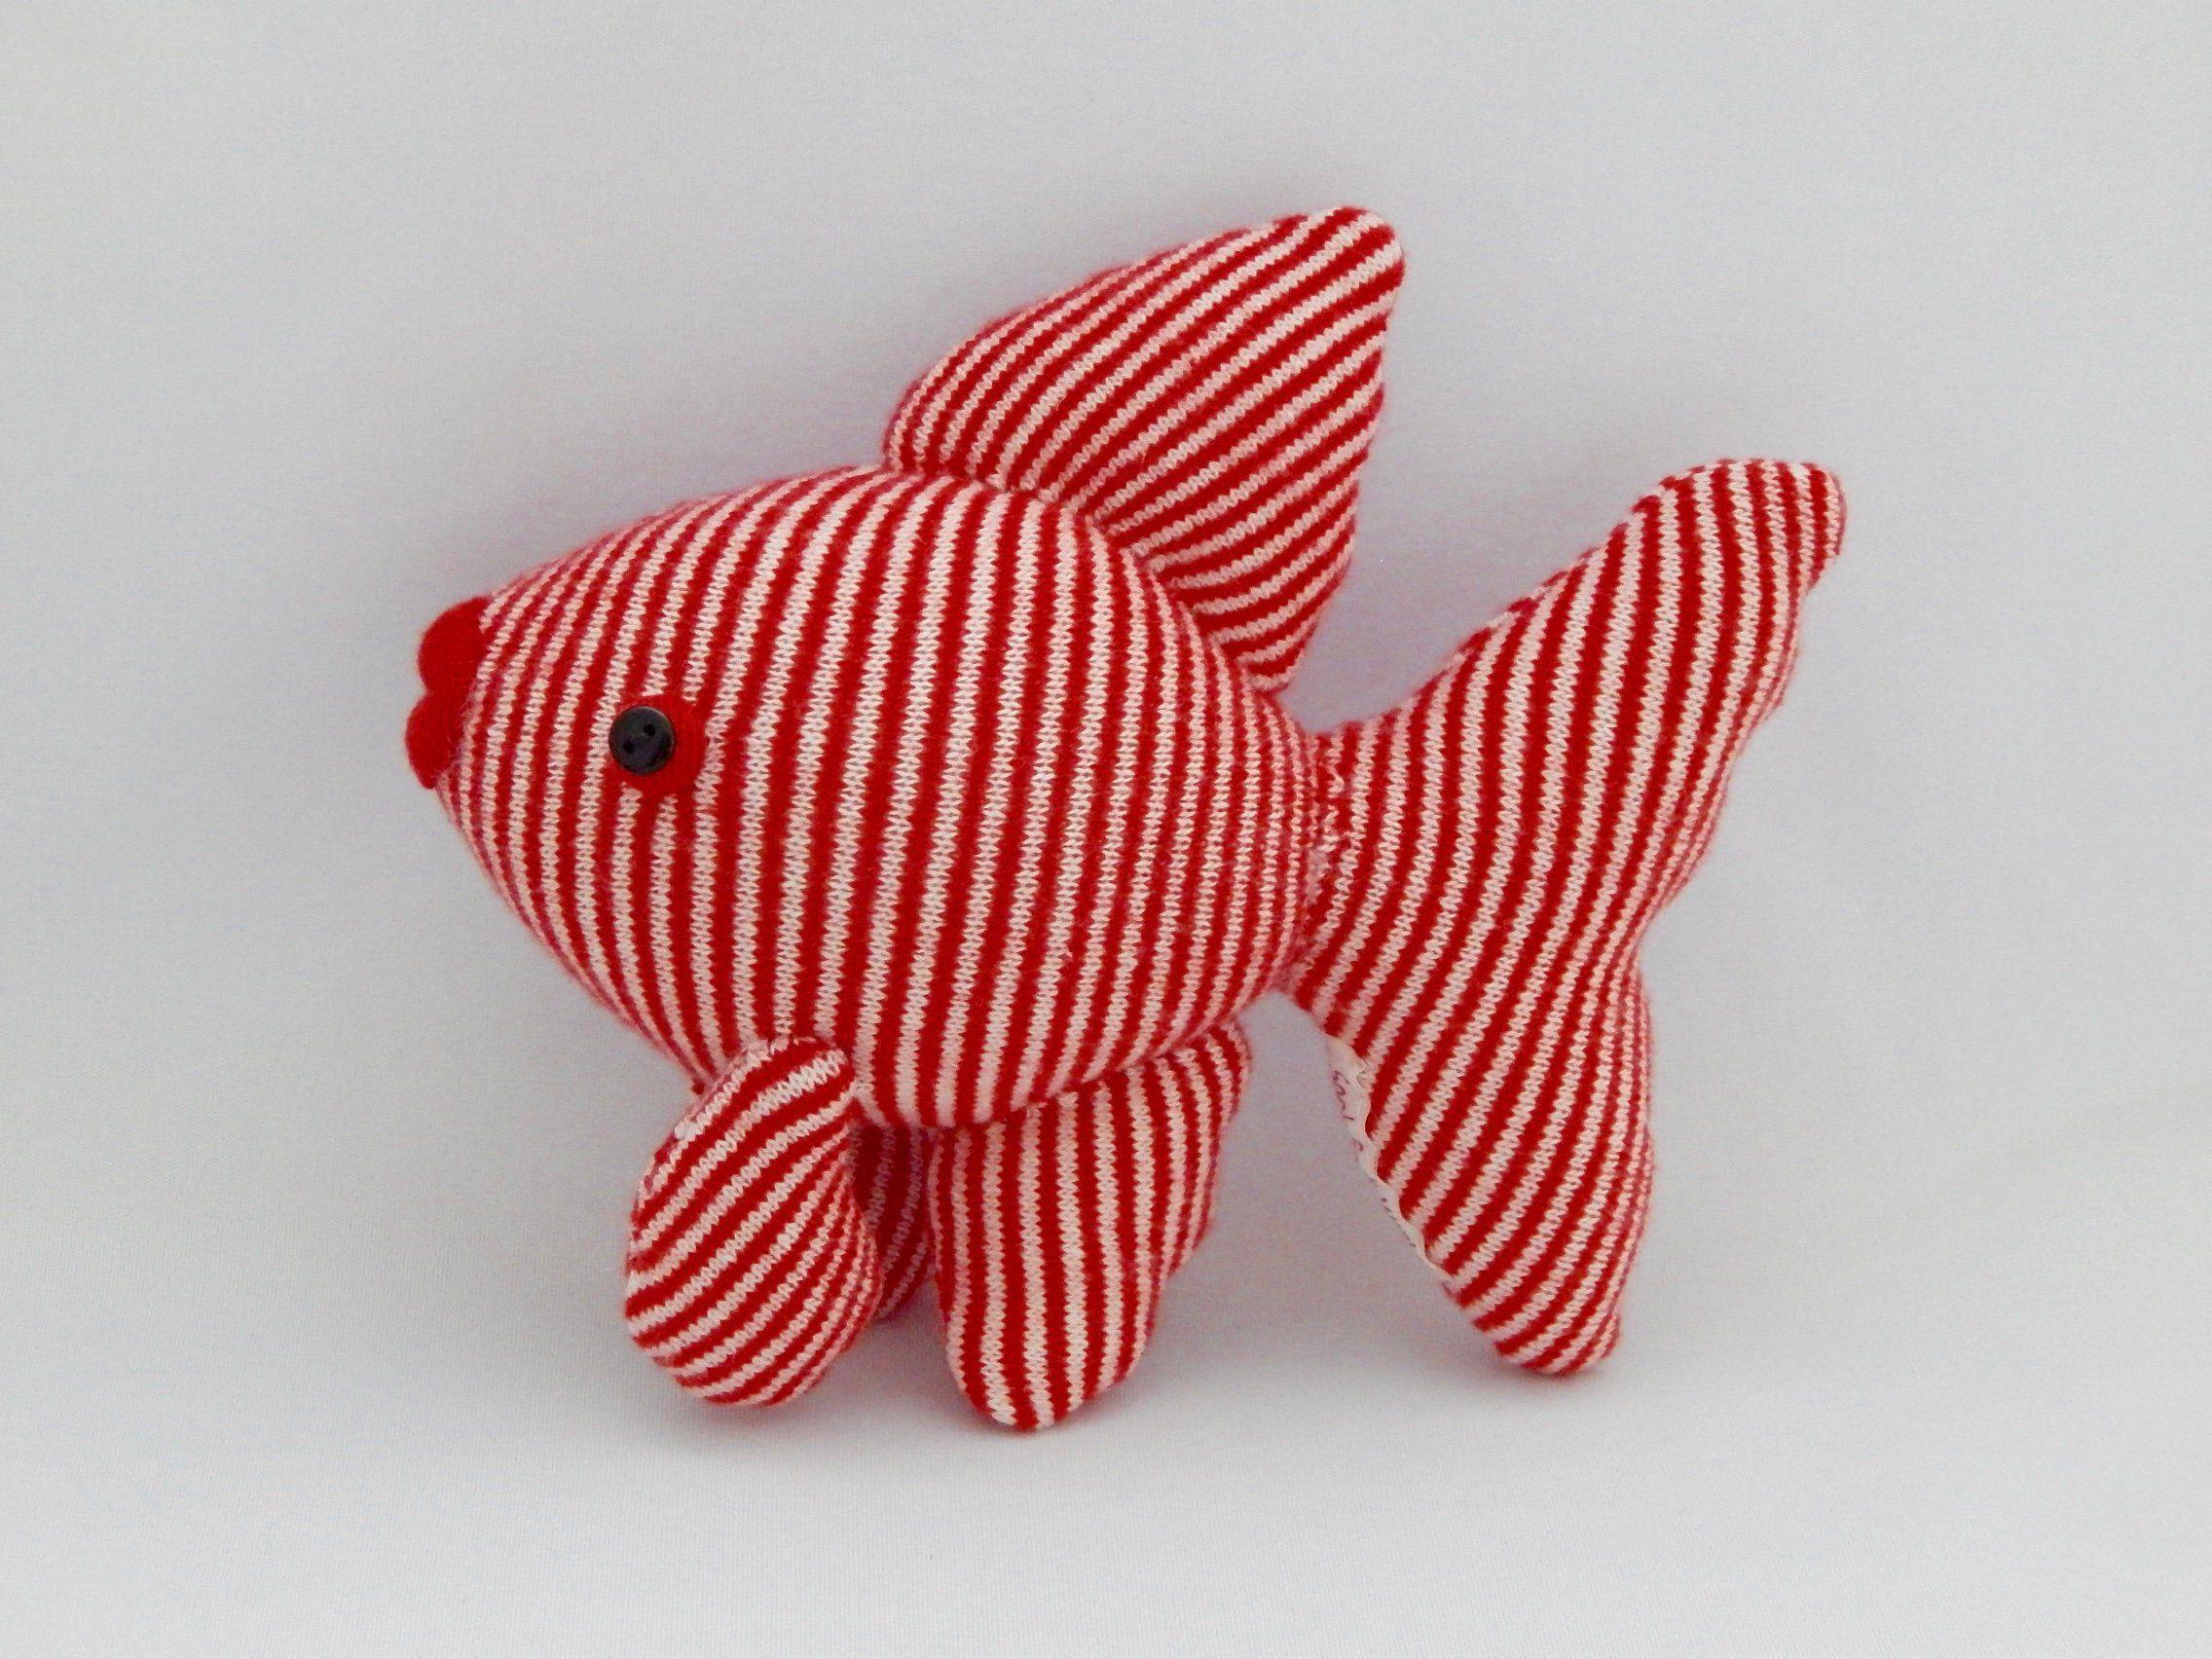 Goldfish Plush Toy, Fish Plushie, Stuffed Animal, Sock Monkey, Stuffed Toy Goldfish Plush Toy, Fish Plushie, Stuffed Animal, Sock Monkey, Stuffed Toy by SockSockWorld on Etsy #animal #FISH #Goldfish #Monkey #Plush #Plushie #Sock #stuffed #toy